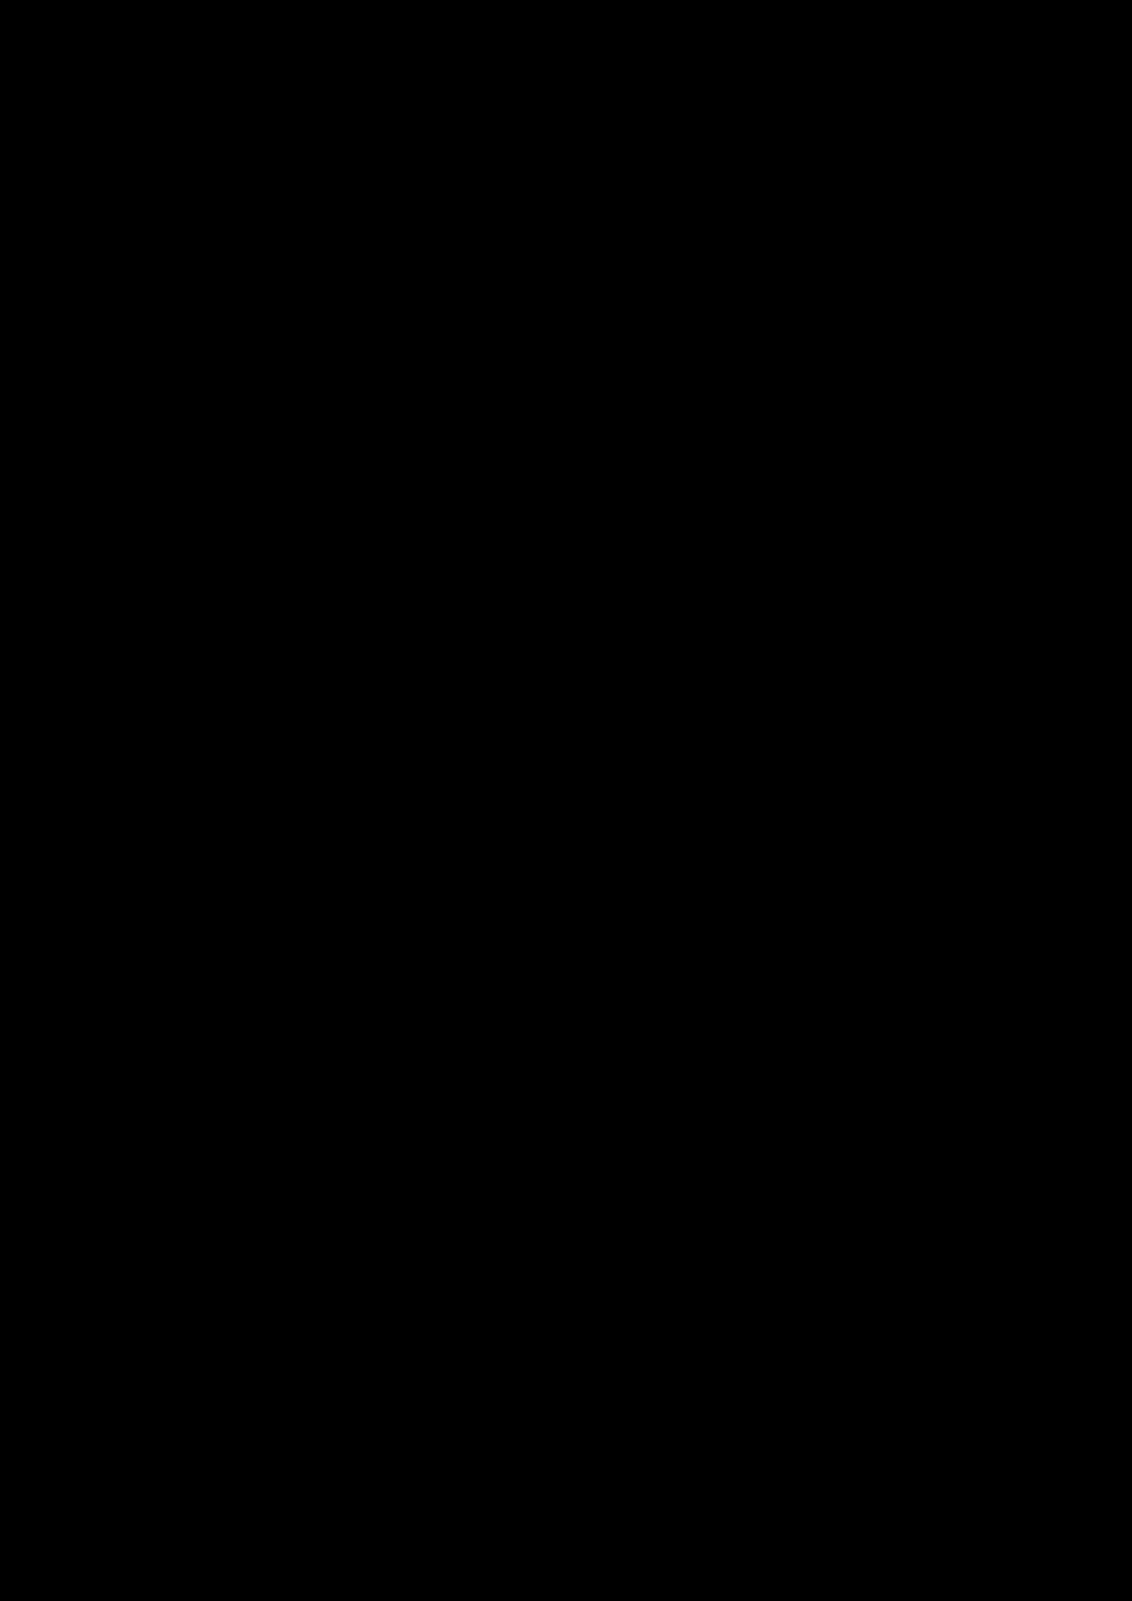 Korolevstvo slez slide, Image 34